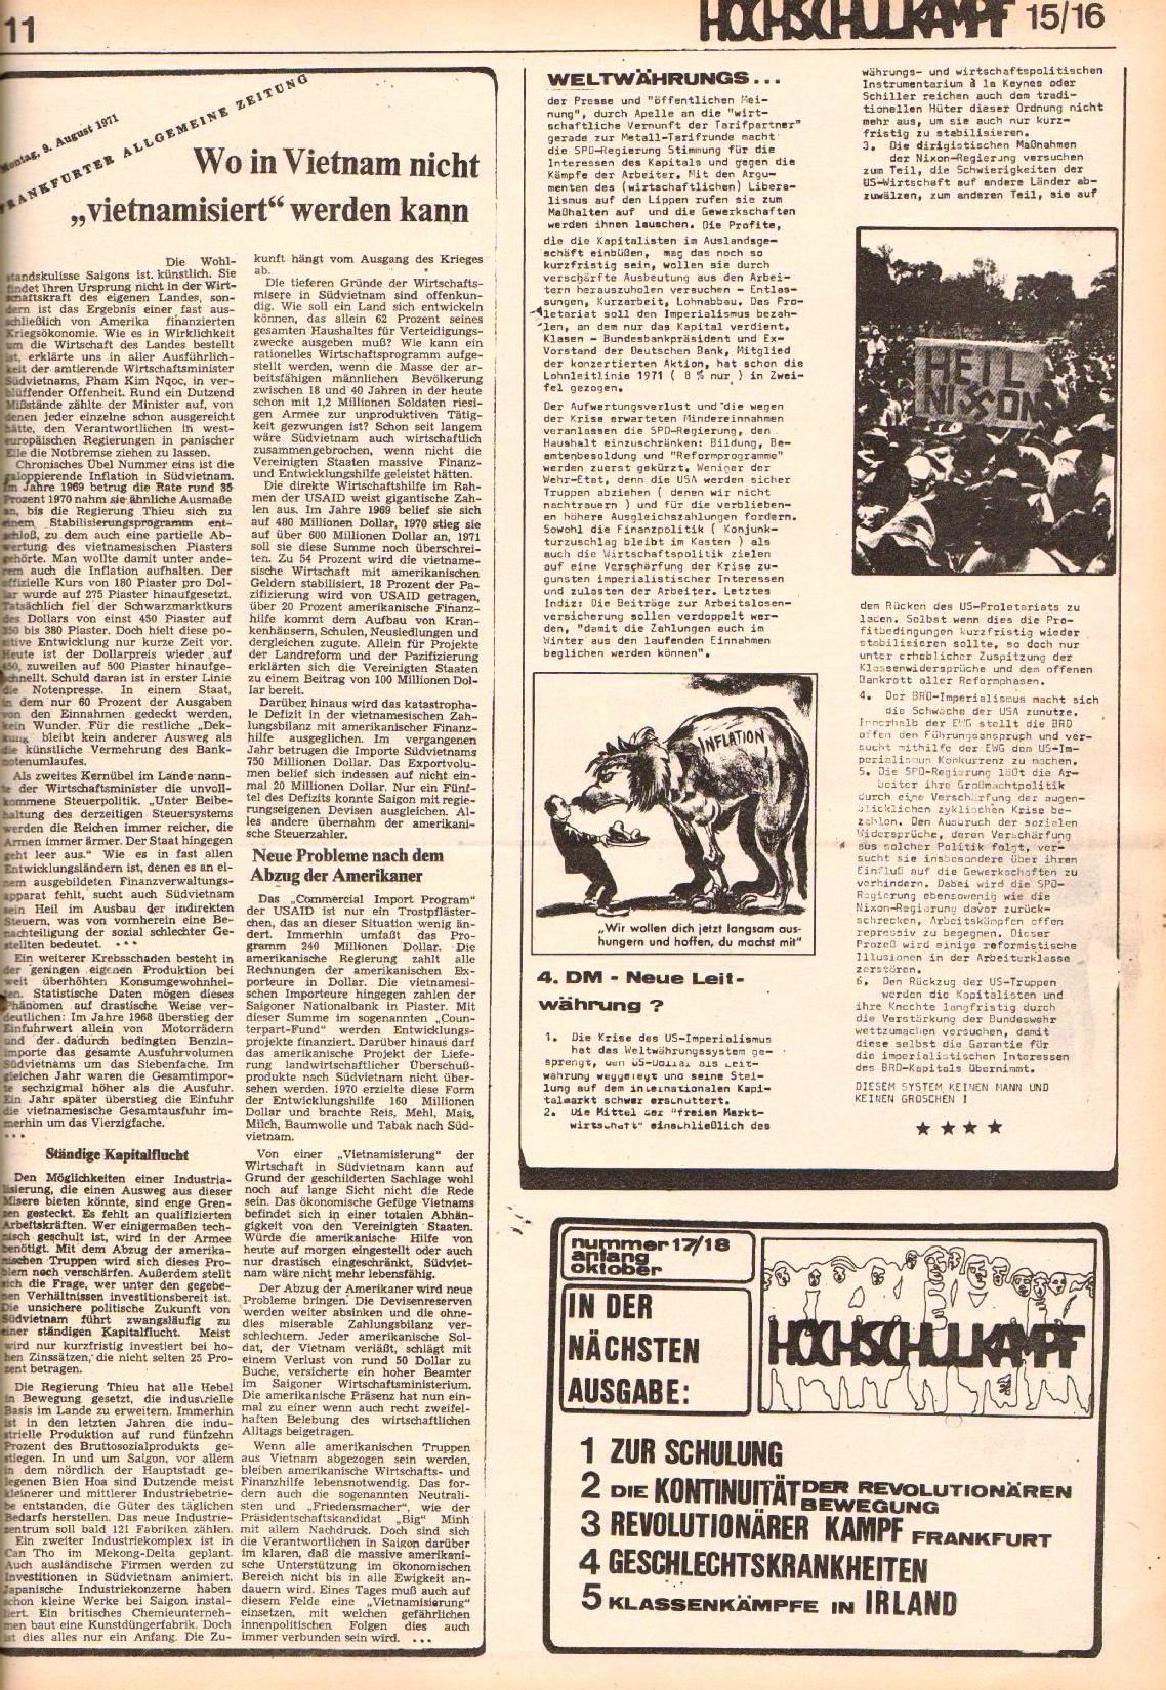 Berlin_Hochschulkampf_1971_15_11